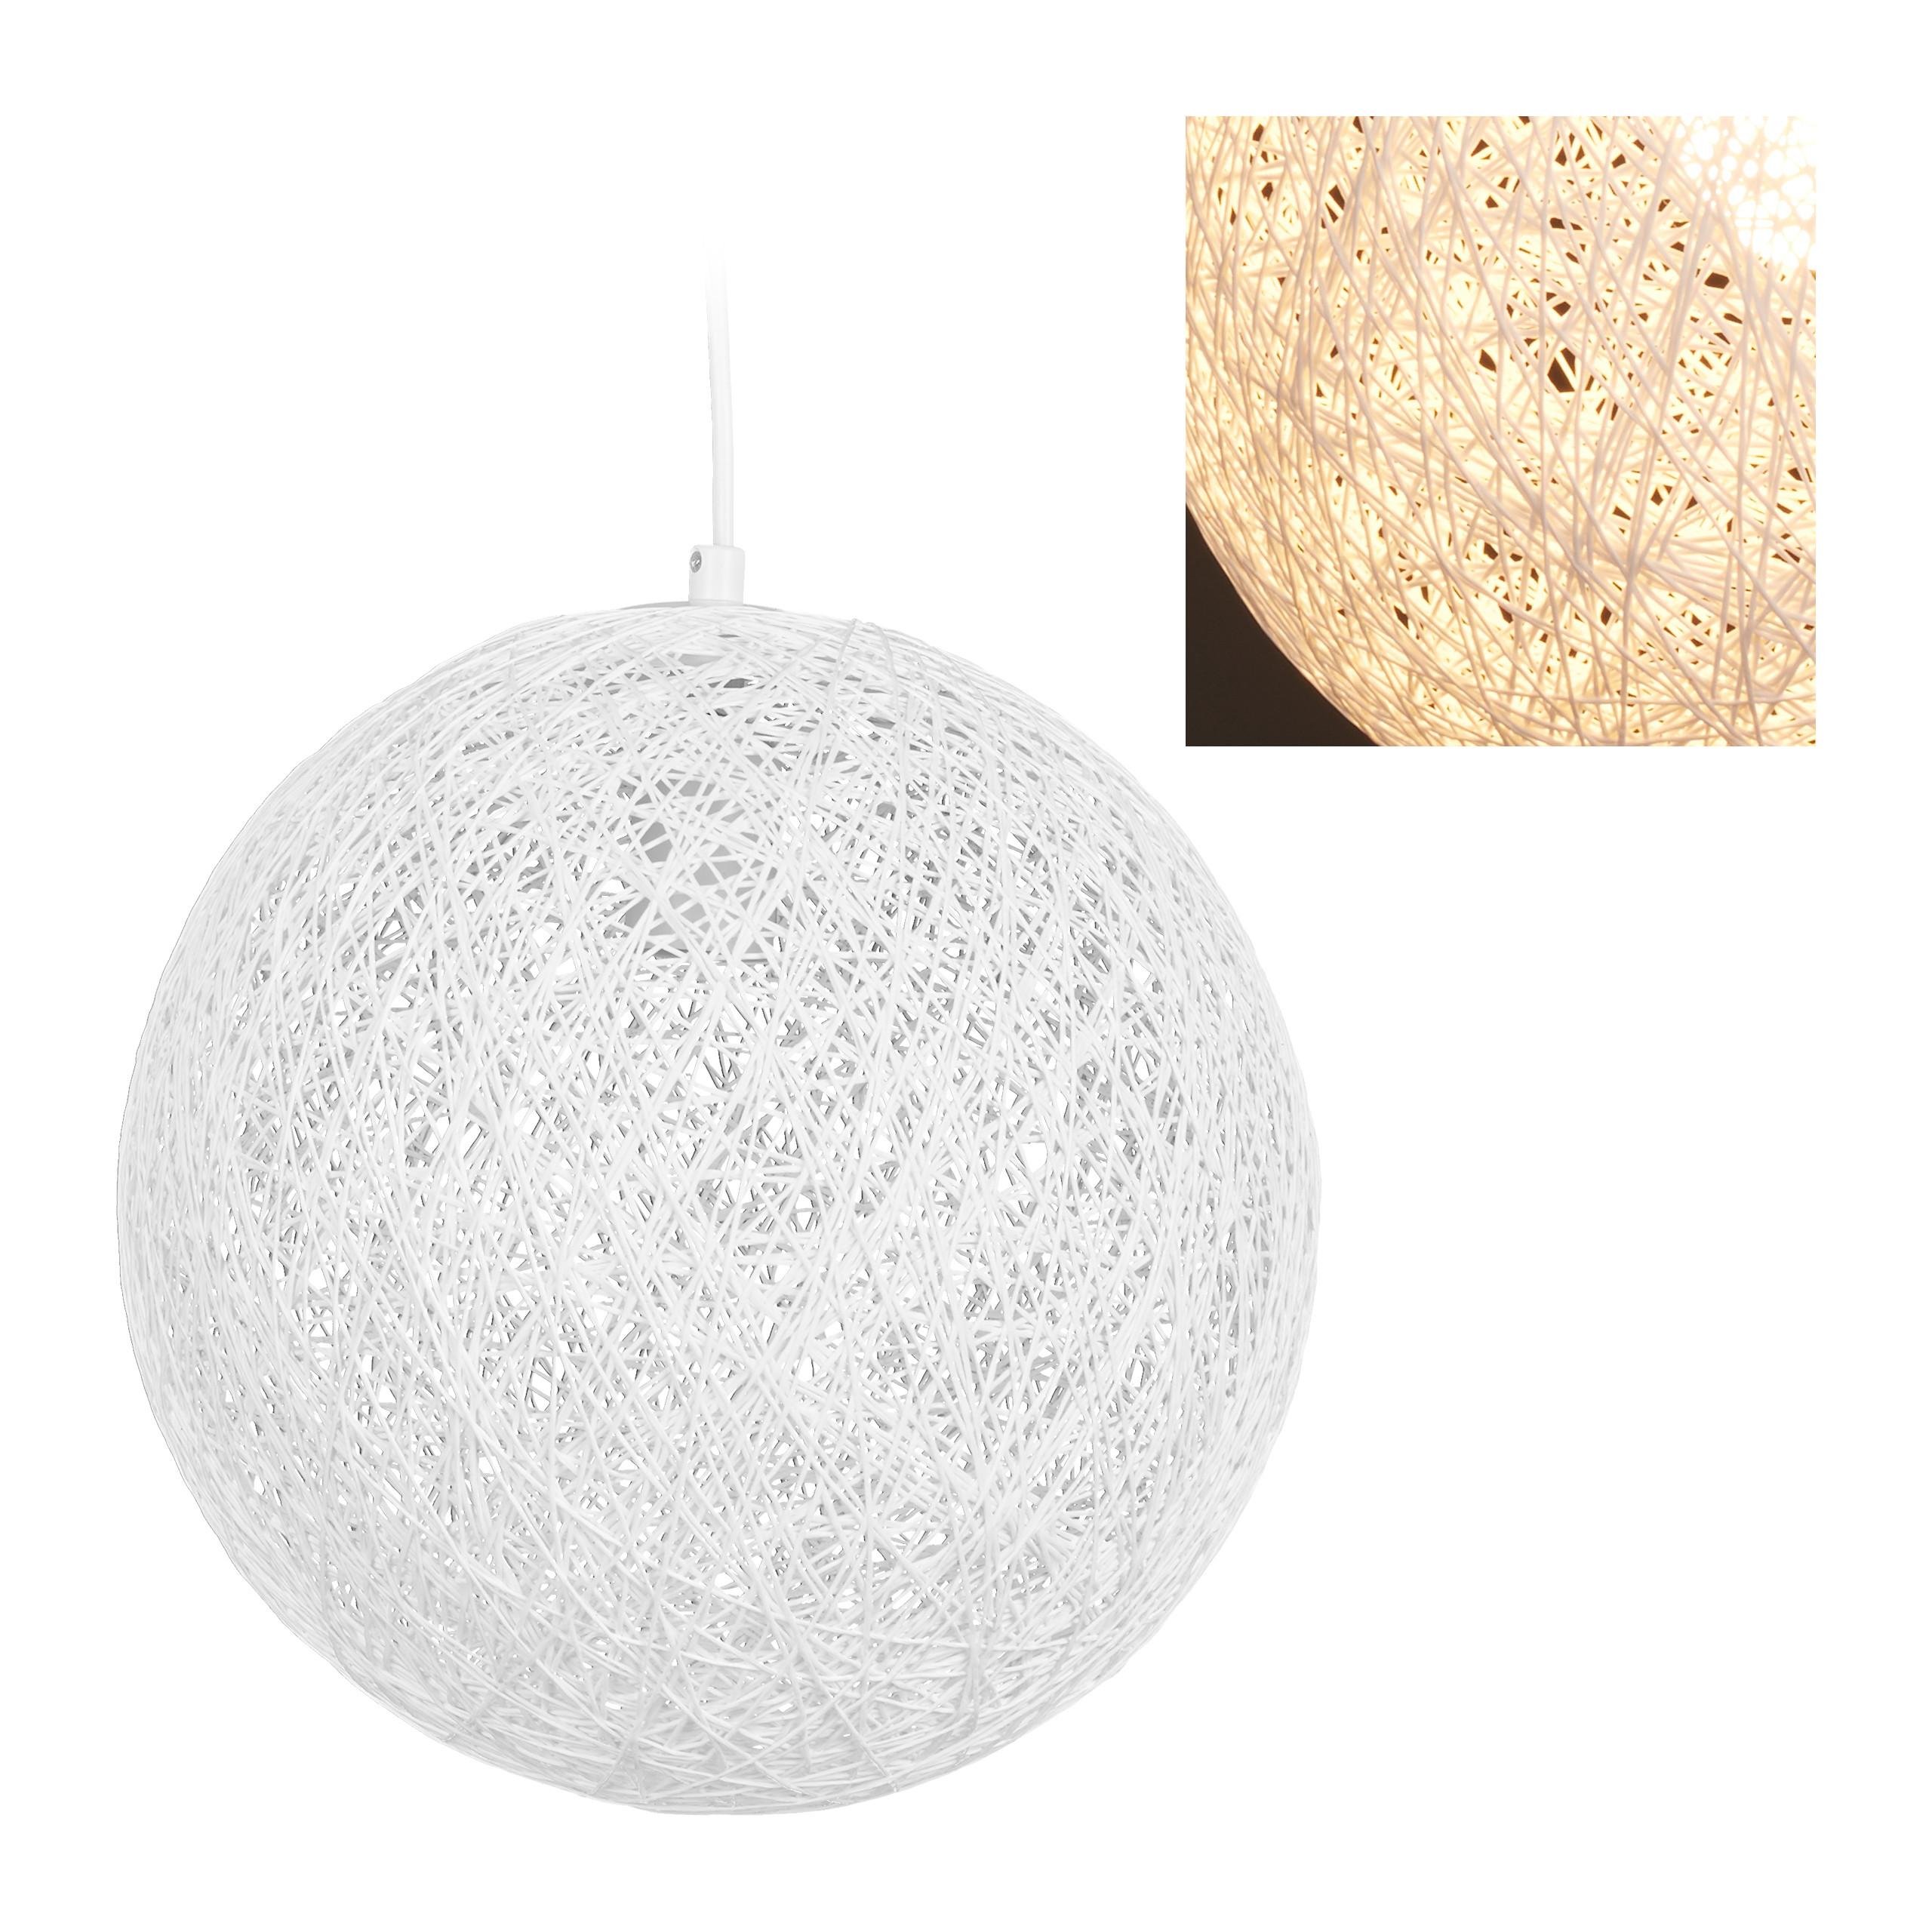 Rattan Lampe weiß Hängelampe Pendelleuchte Geflechtlampe Kugelleuchte hang lamp